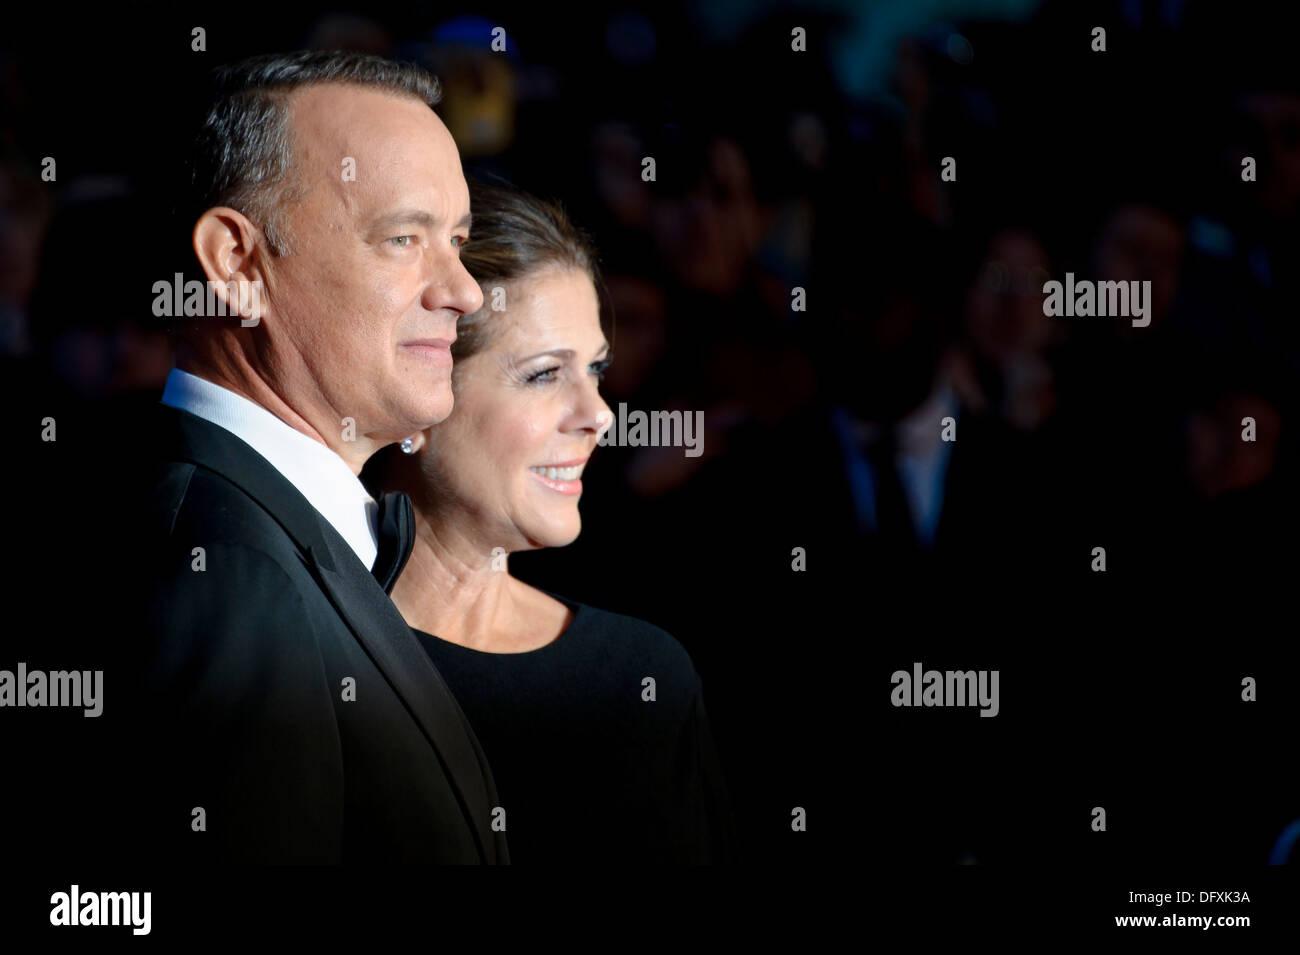 U.S actors Tom Hanks and Rita Wilson arrive for the BFI London Film Festival European Premiere of Captain Phillips. - Stock Image